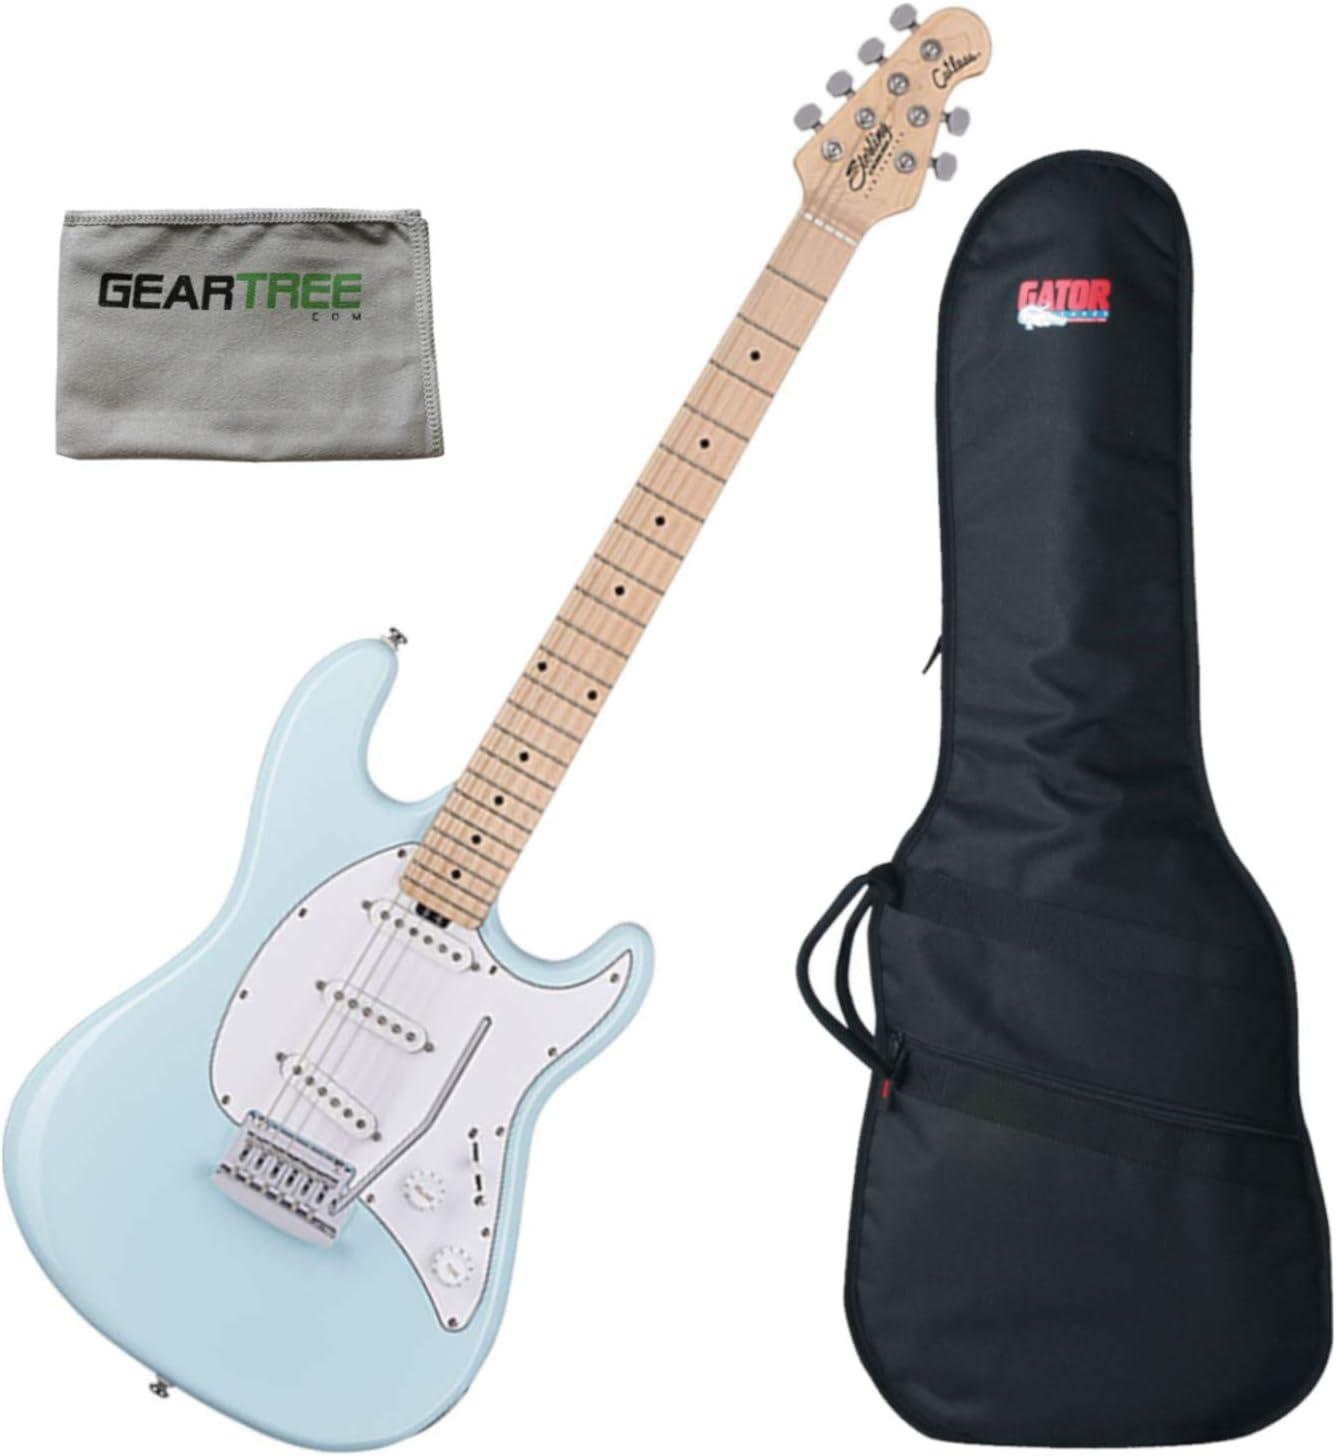 Sterling sale CT30SSSDBLM1 Cutlass SSS Columbus Mall Blue Guitar Daphne Electric